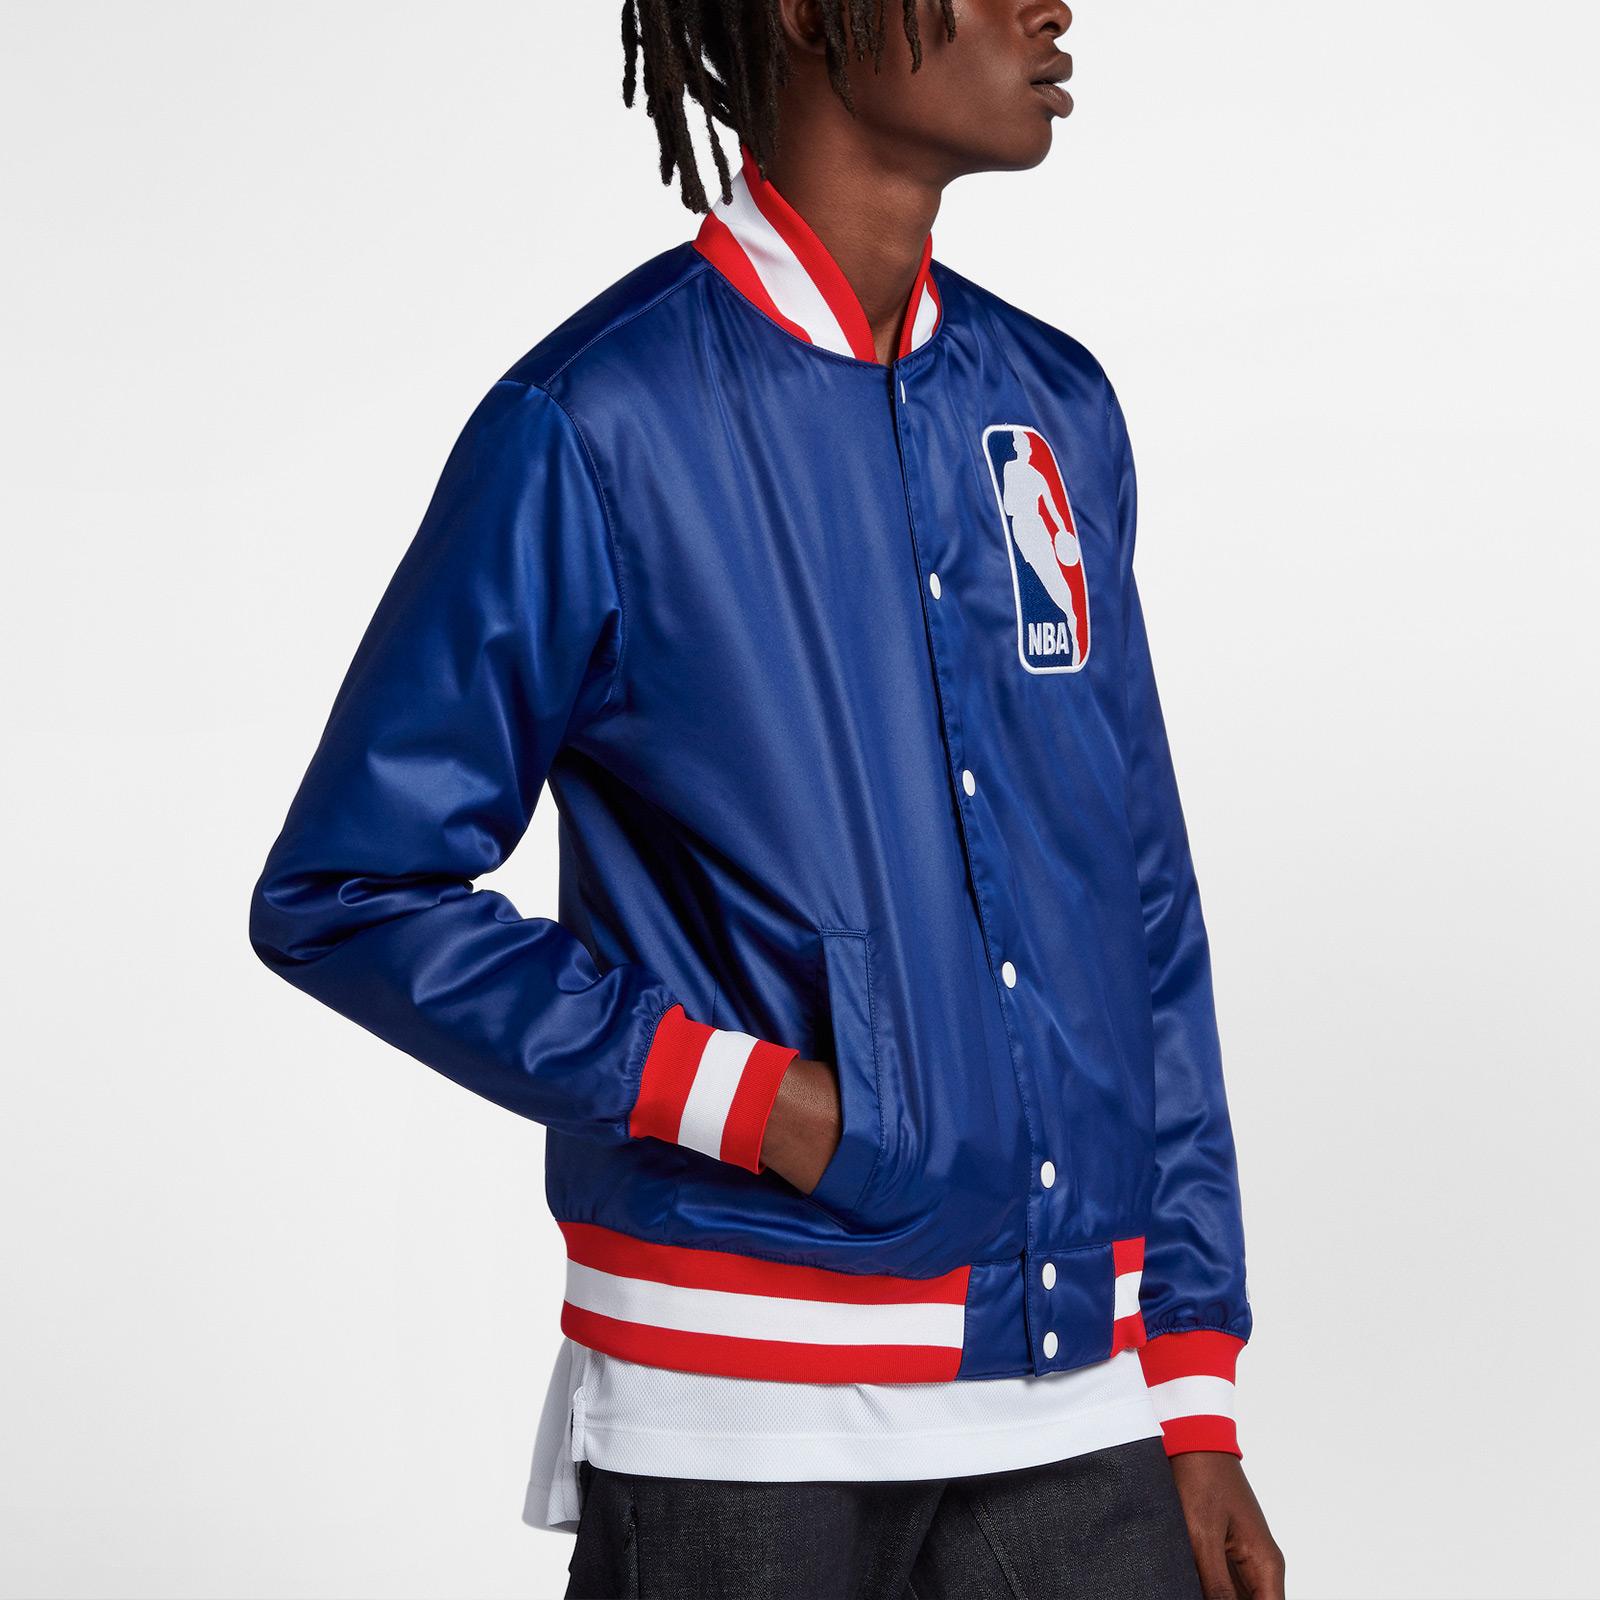 Nike SB x NBA Bomber Jacket - Ah3392-455 - SNS | sneakers ...